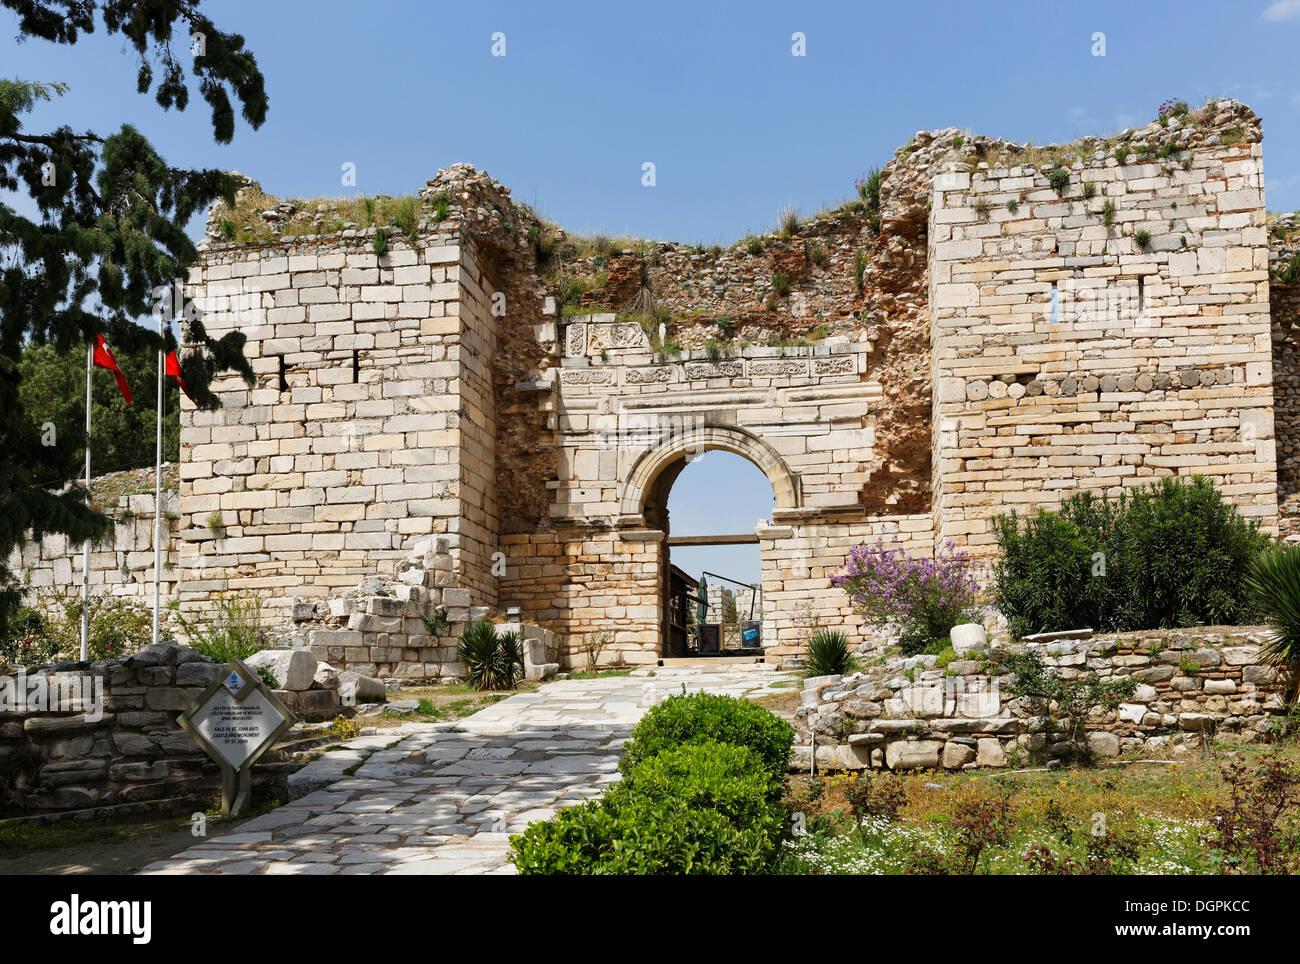 Gate of Persecution of the Basilica of St. John of Ephesus, Ephesus, Selçuk, İzmir Province, Aegean Region, Turkey - Stock Image